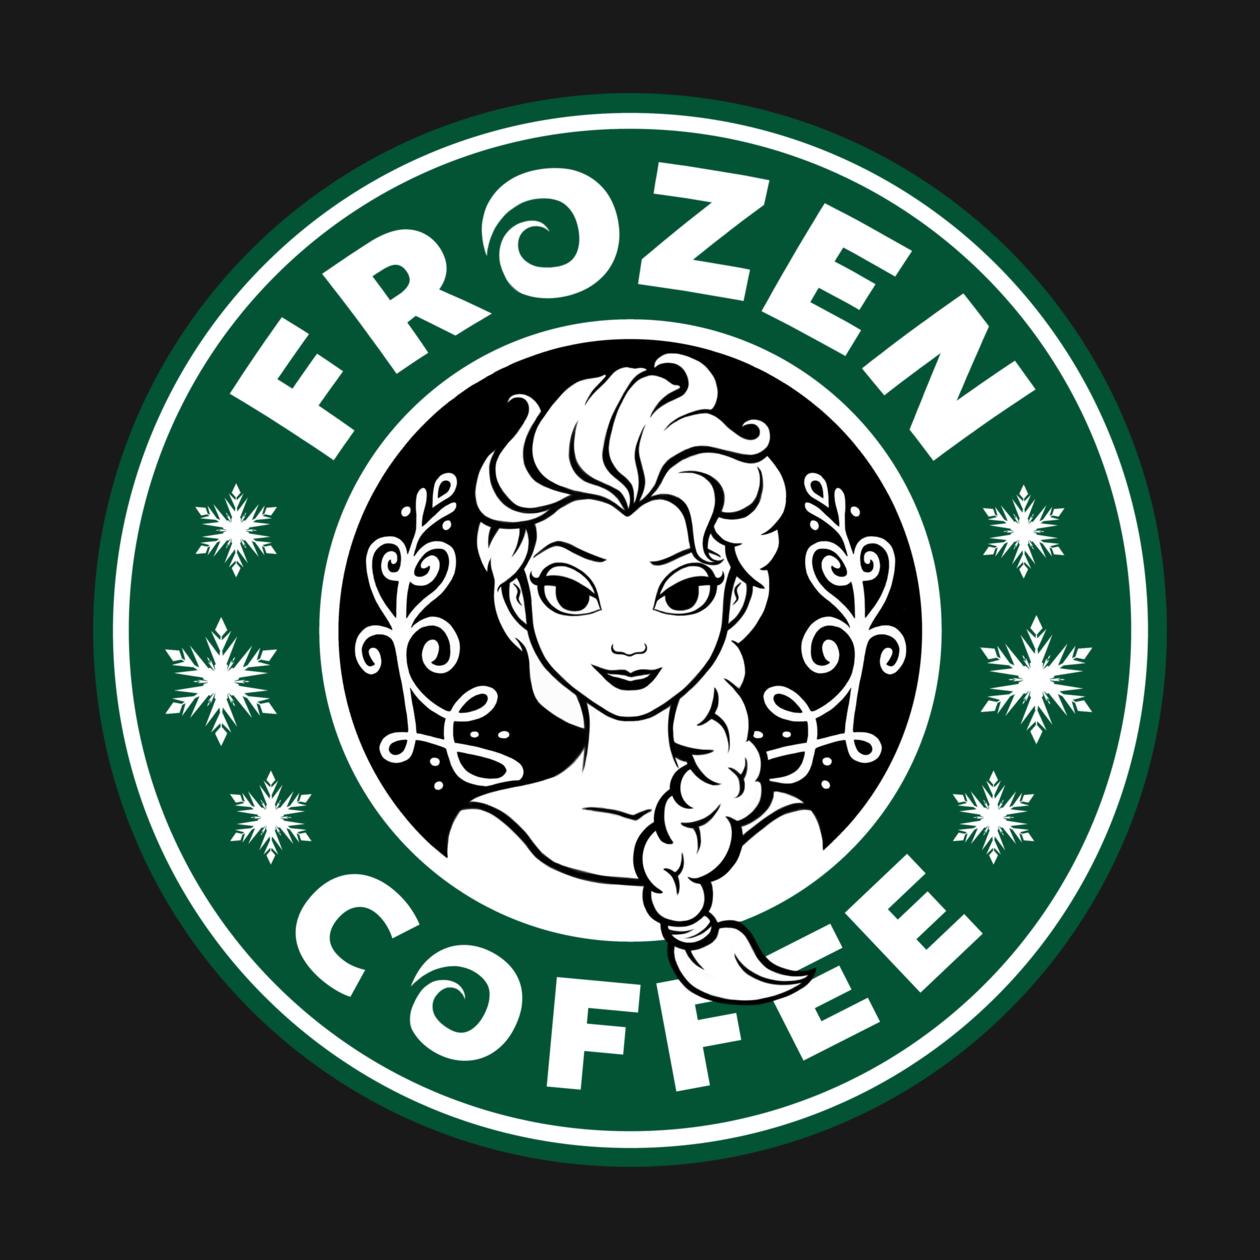 Frozen Coffee Disney starbucks, Frozen coffee, Disney